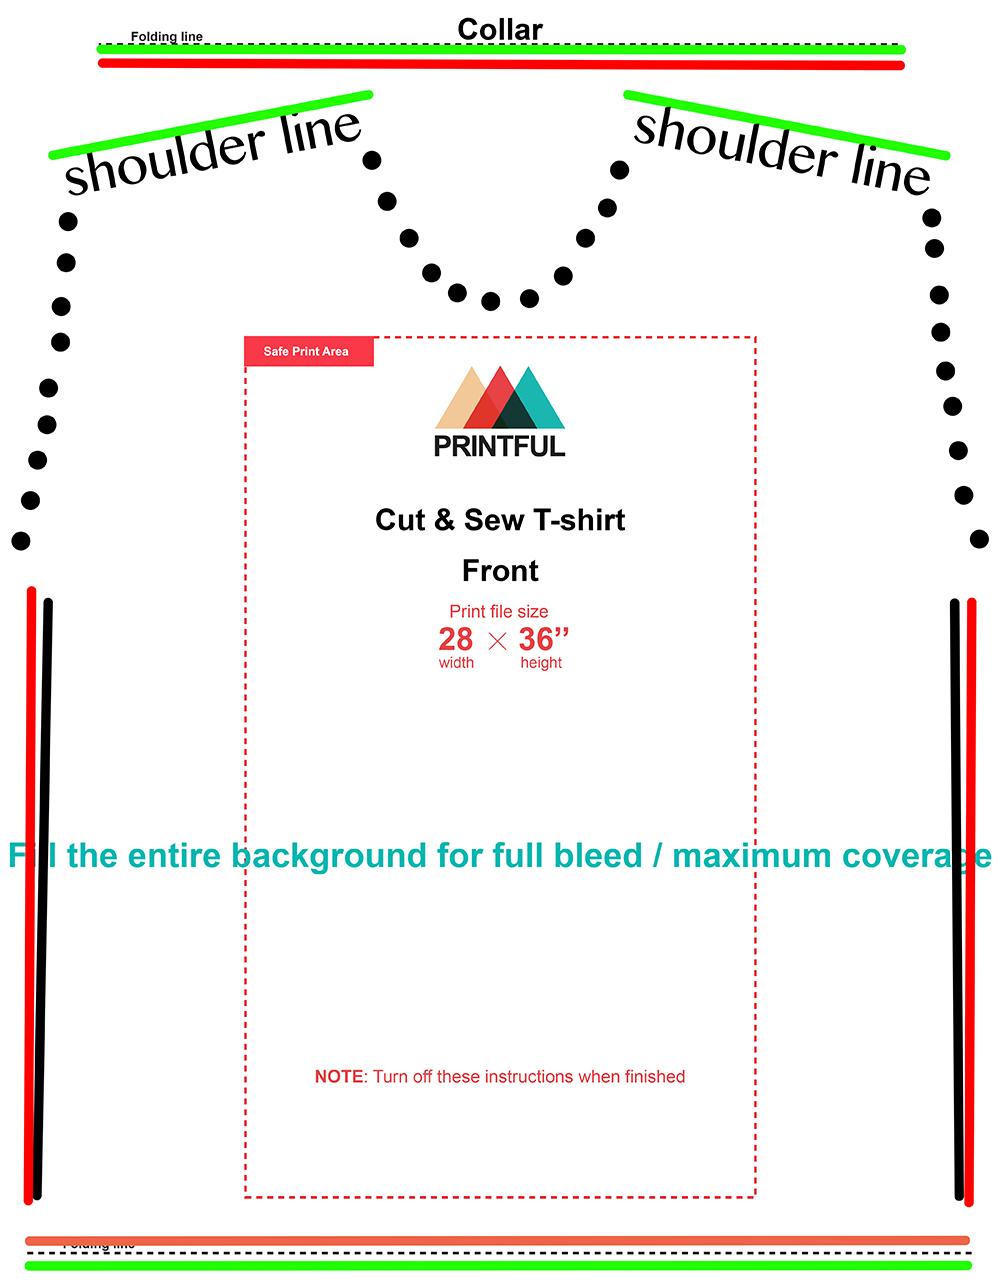 shirt boundaires test.jpg